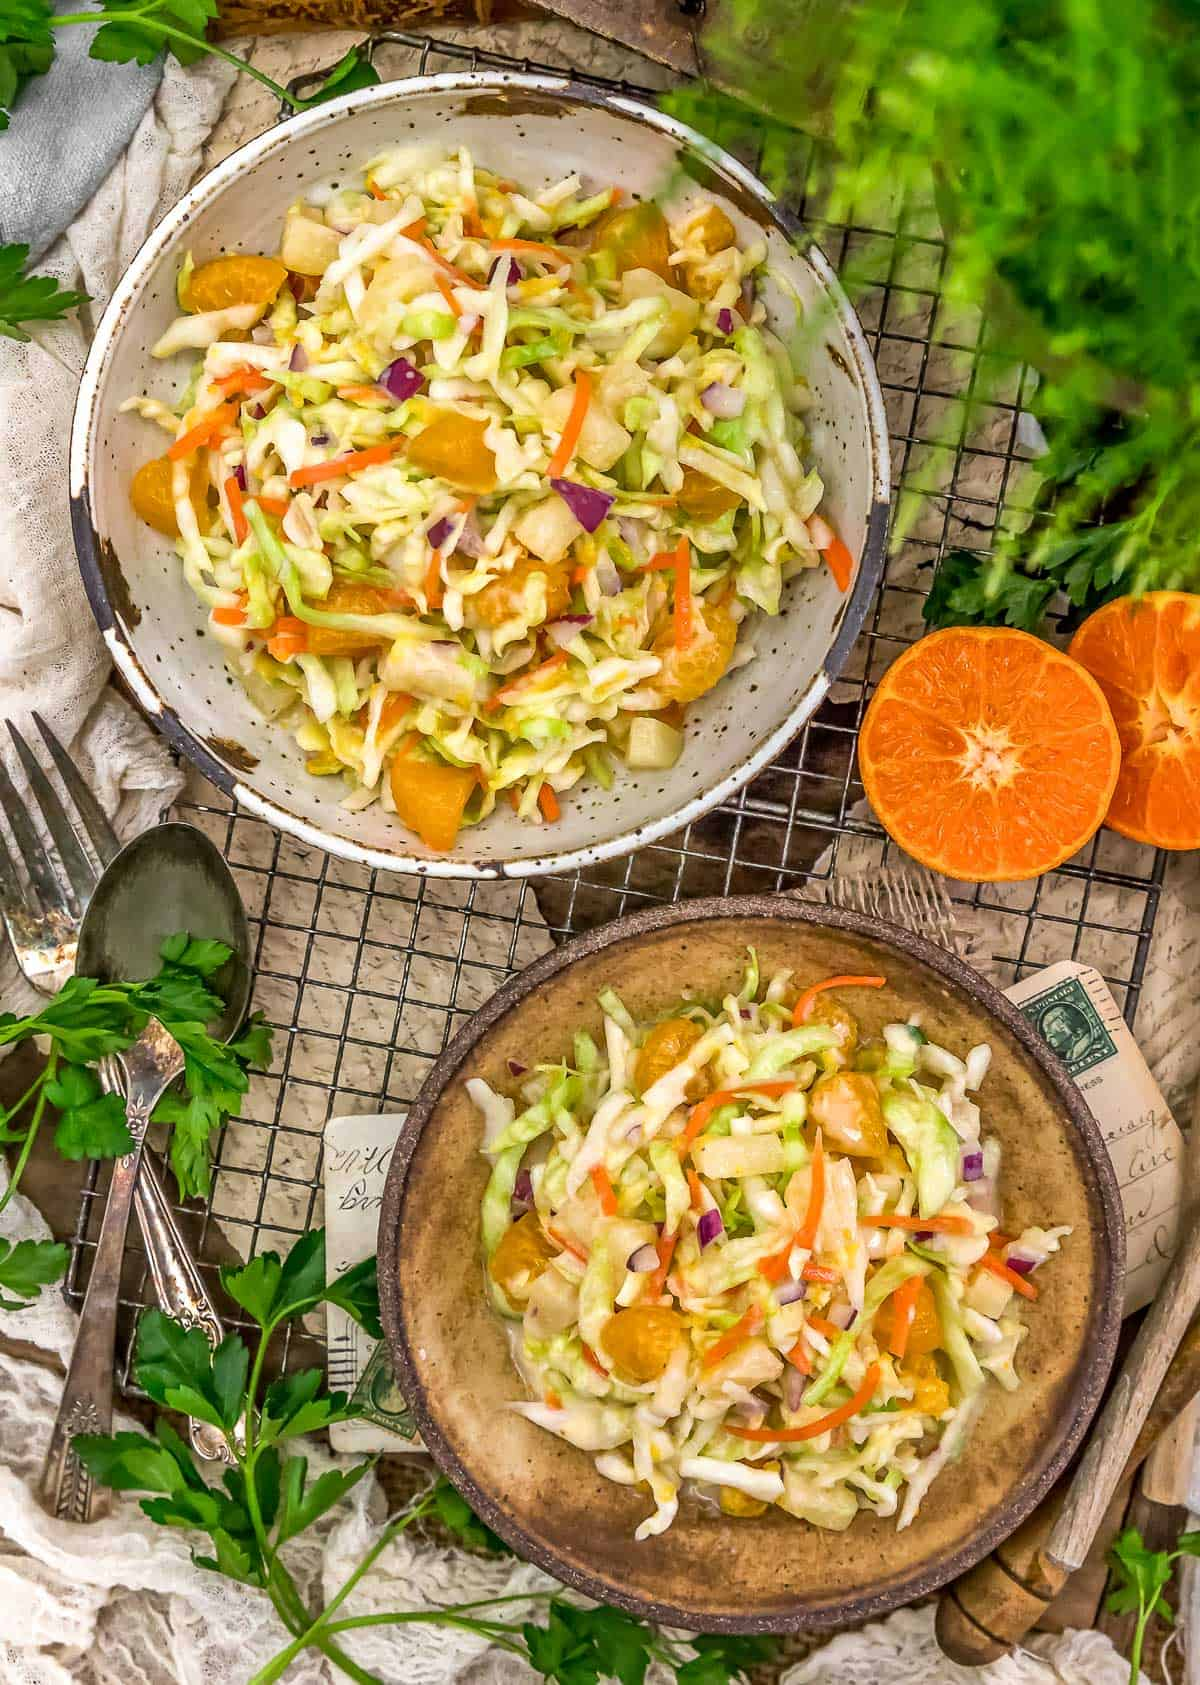 Tablescape of Vegan Tropical Coleslaw